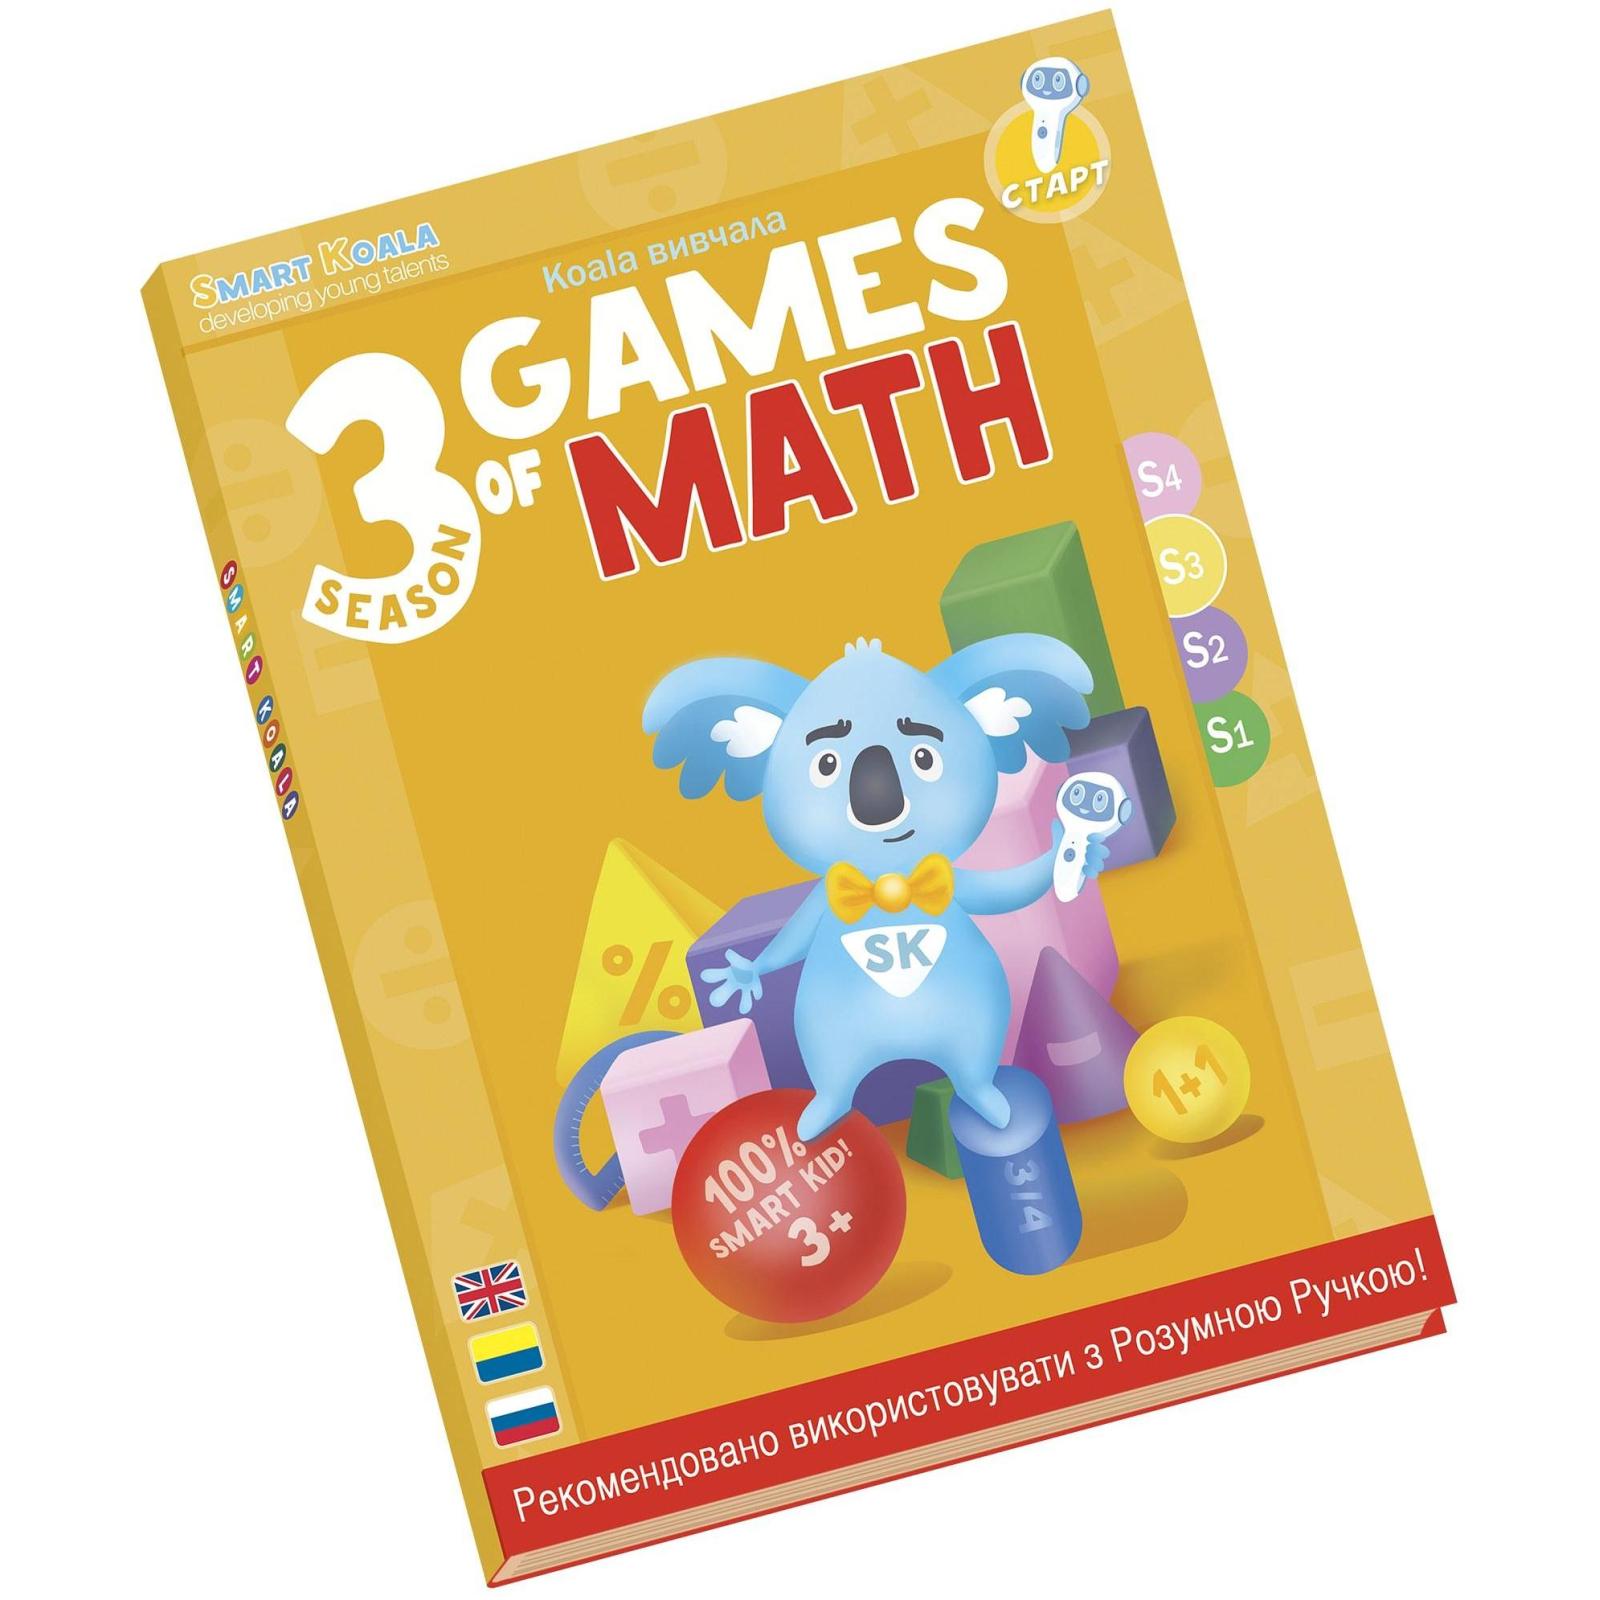 Интерактивная игрушка Smart Koala развивающая книга The Games of Math (Season 3) №3 (SKBGMS3)